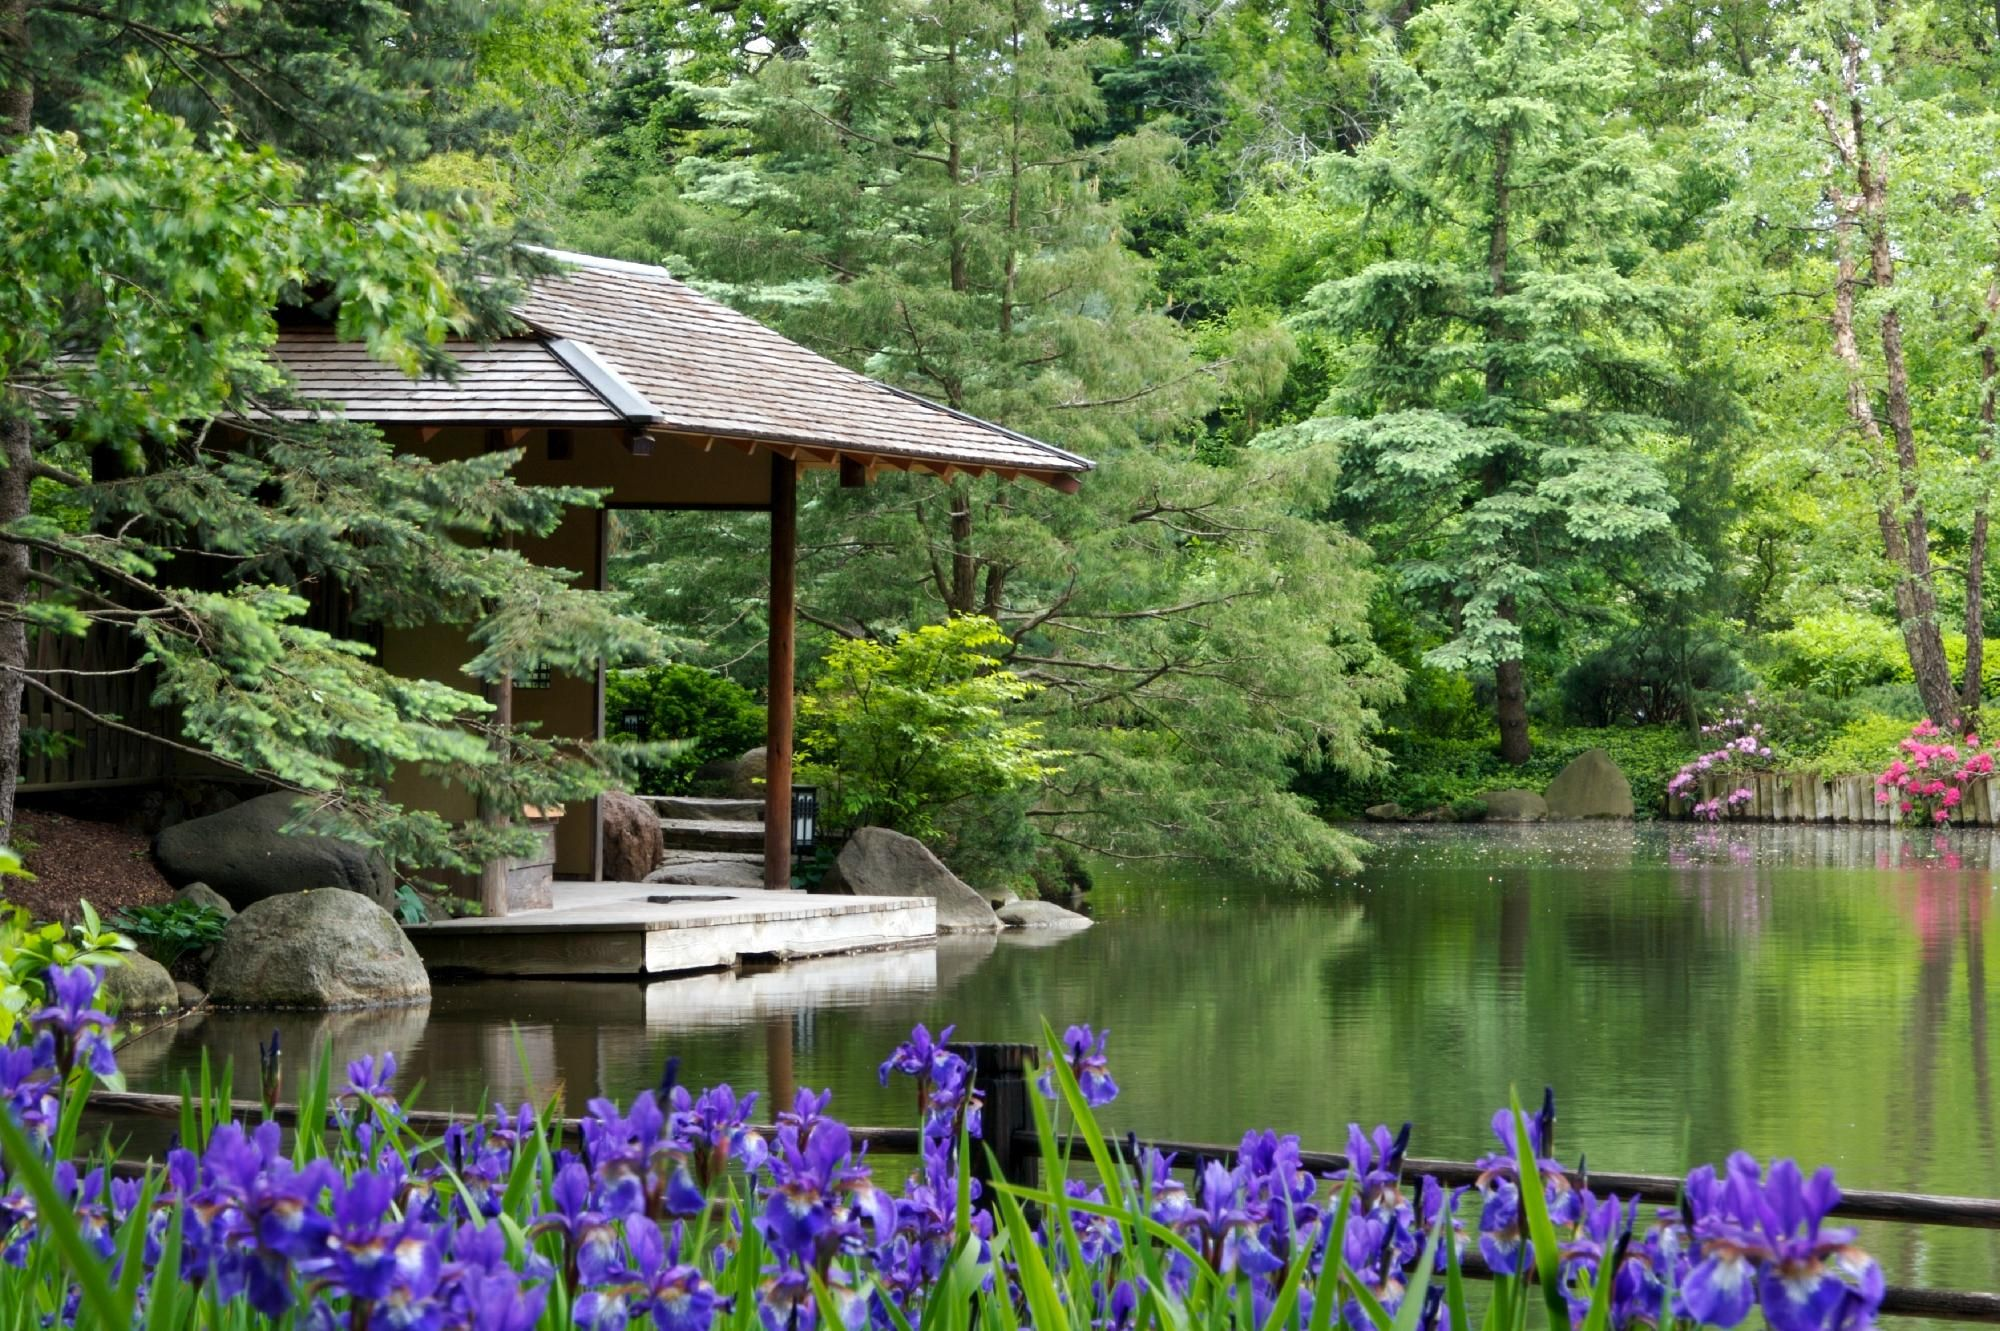 4430157e7306404ae4d1c38a1dfe75ac - Anderson Japanese Gardens Rockford Il Wedding